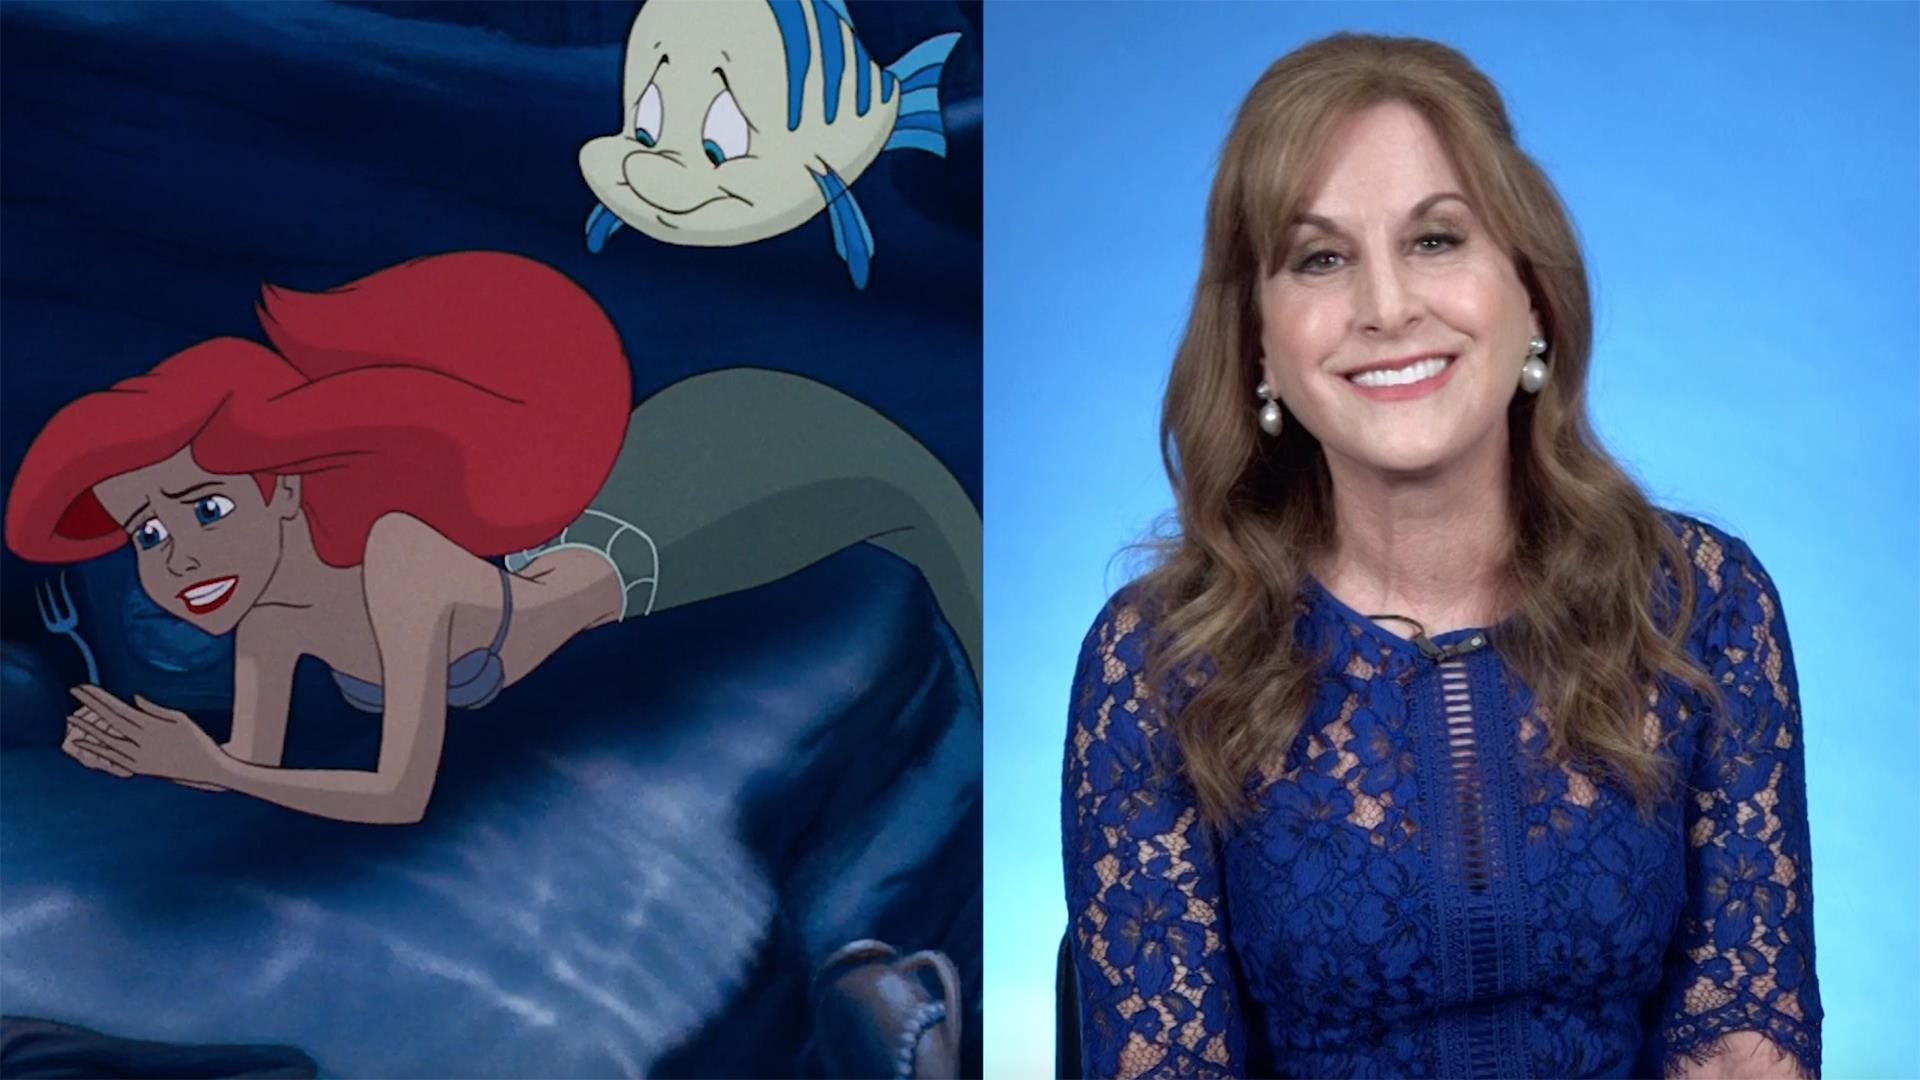 Jodi Benson Voice Of Ariel Looks Back On The Little Mermaid 30 Years Later